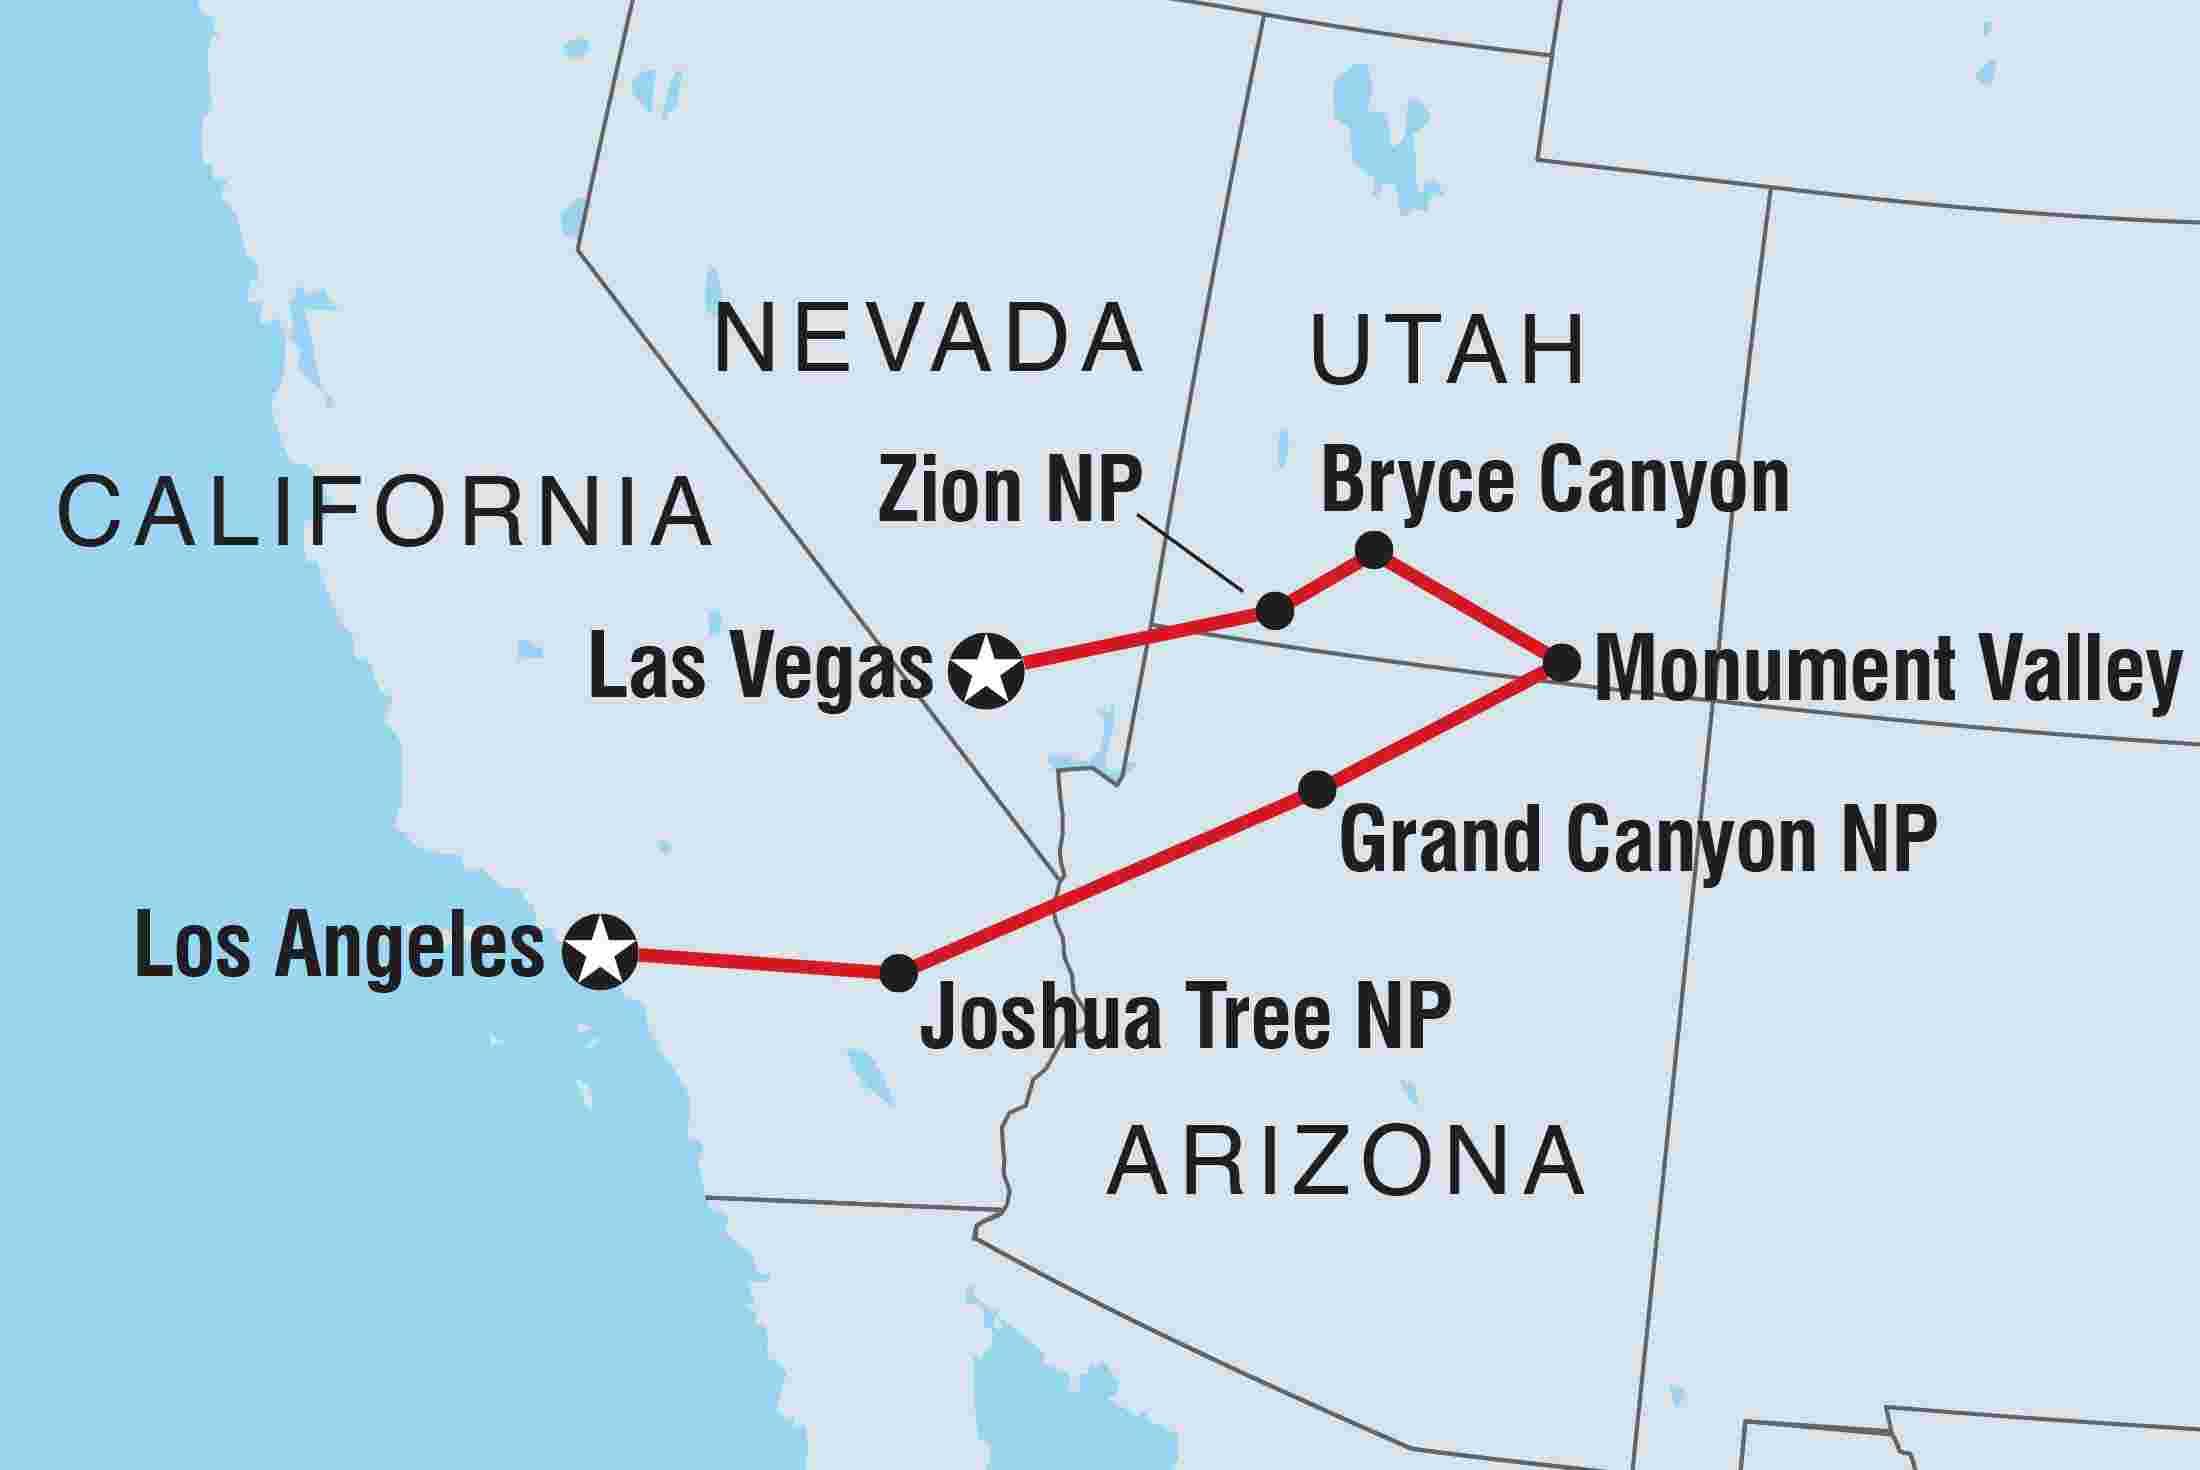 United States Tours & Travel